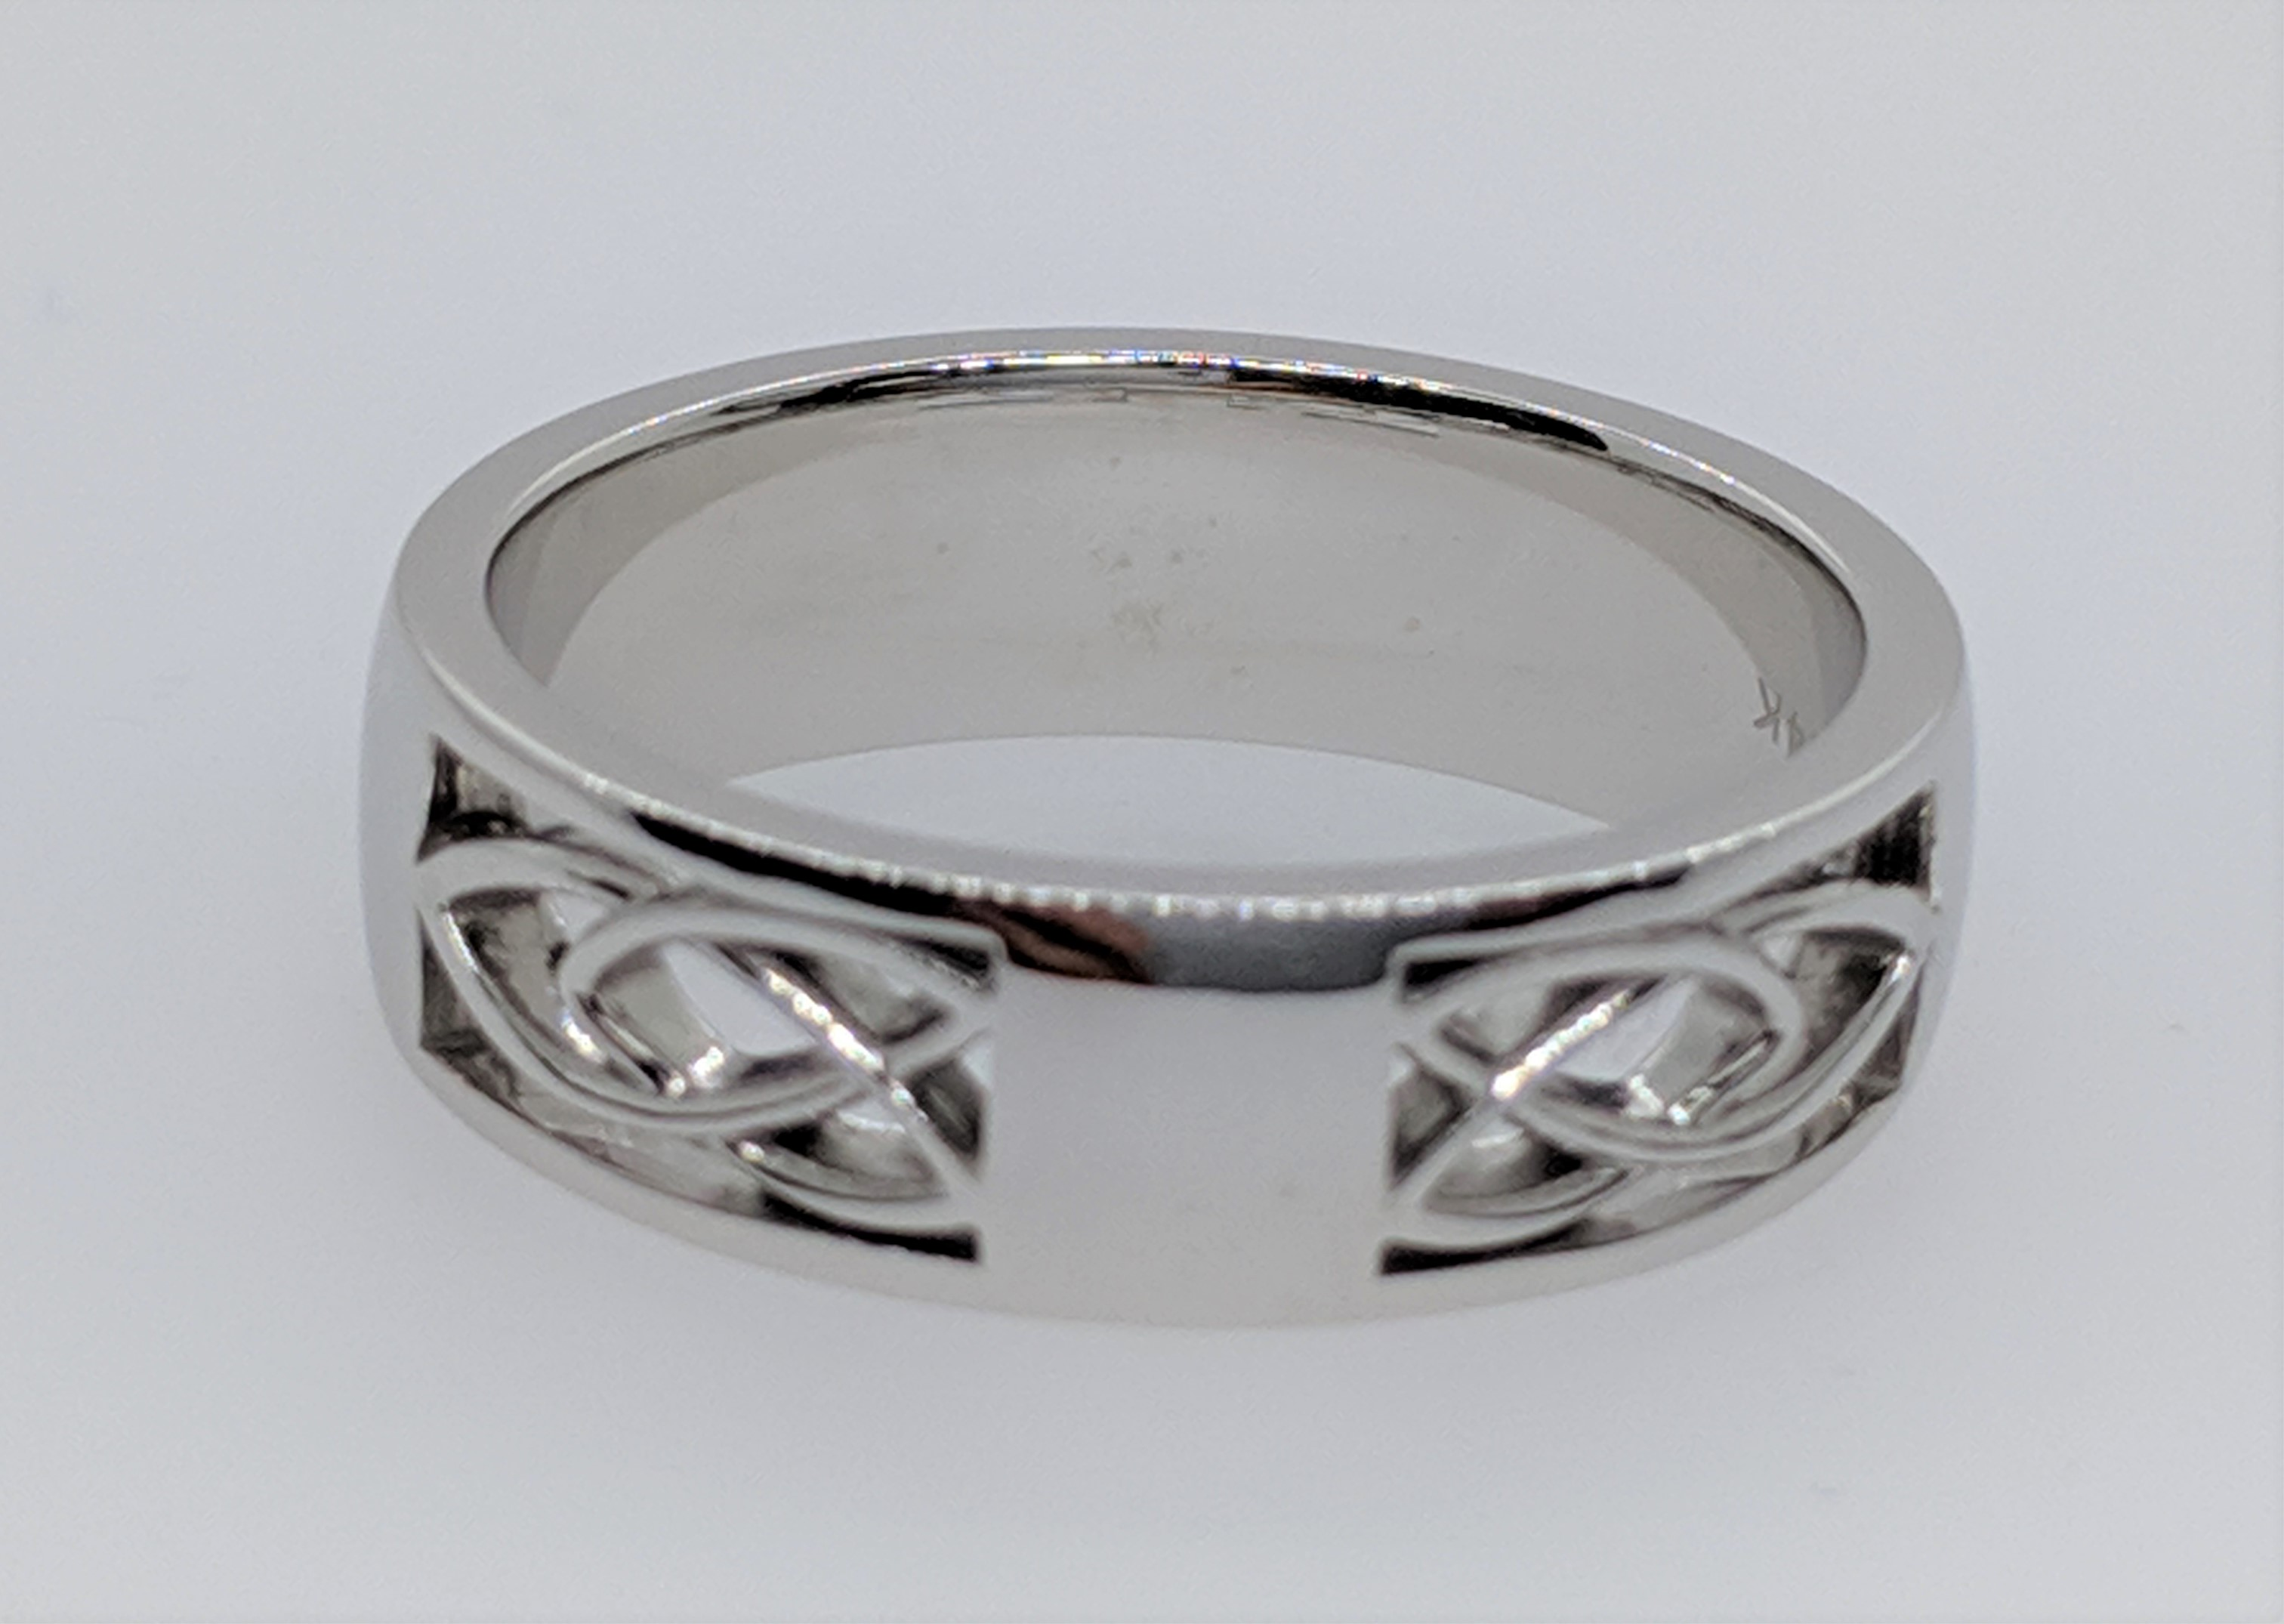 Wedding Band - Celtic Wedding Band 14k white gold, 5mm wide